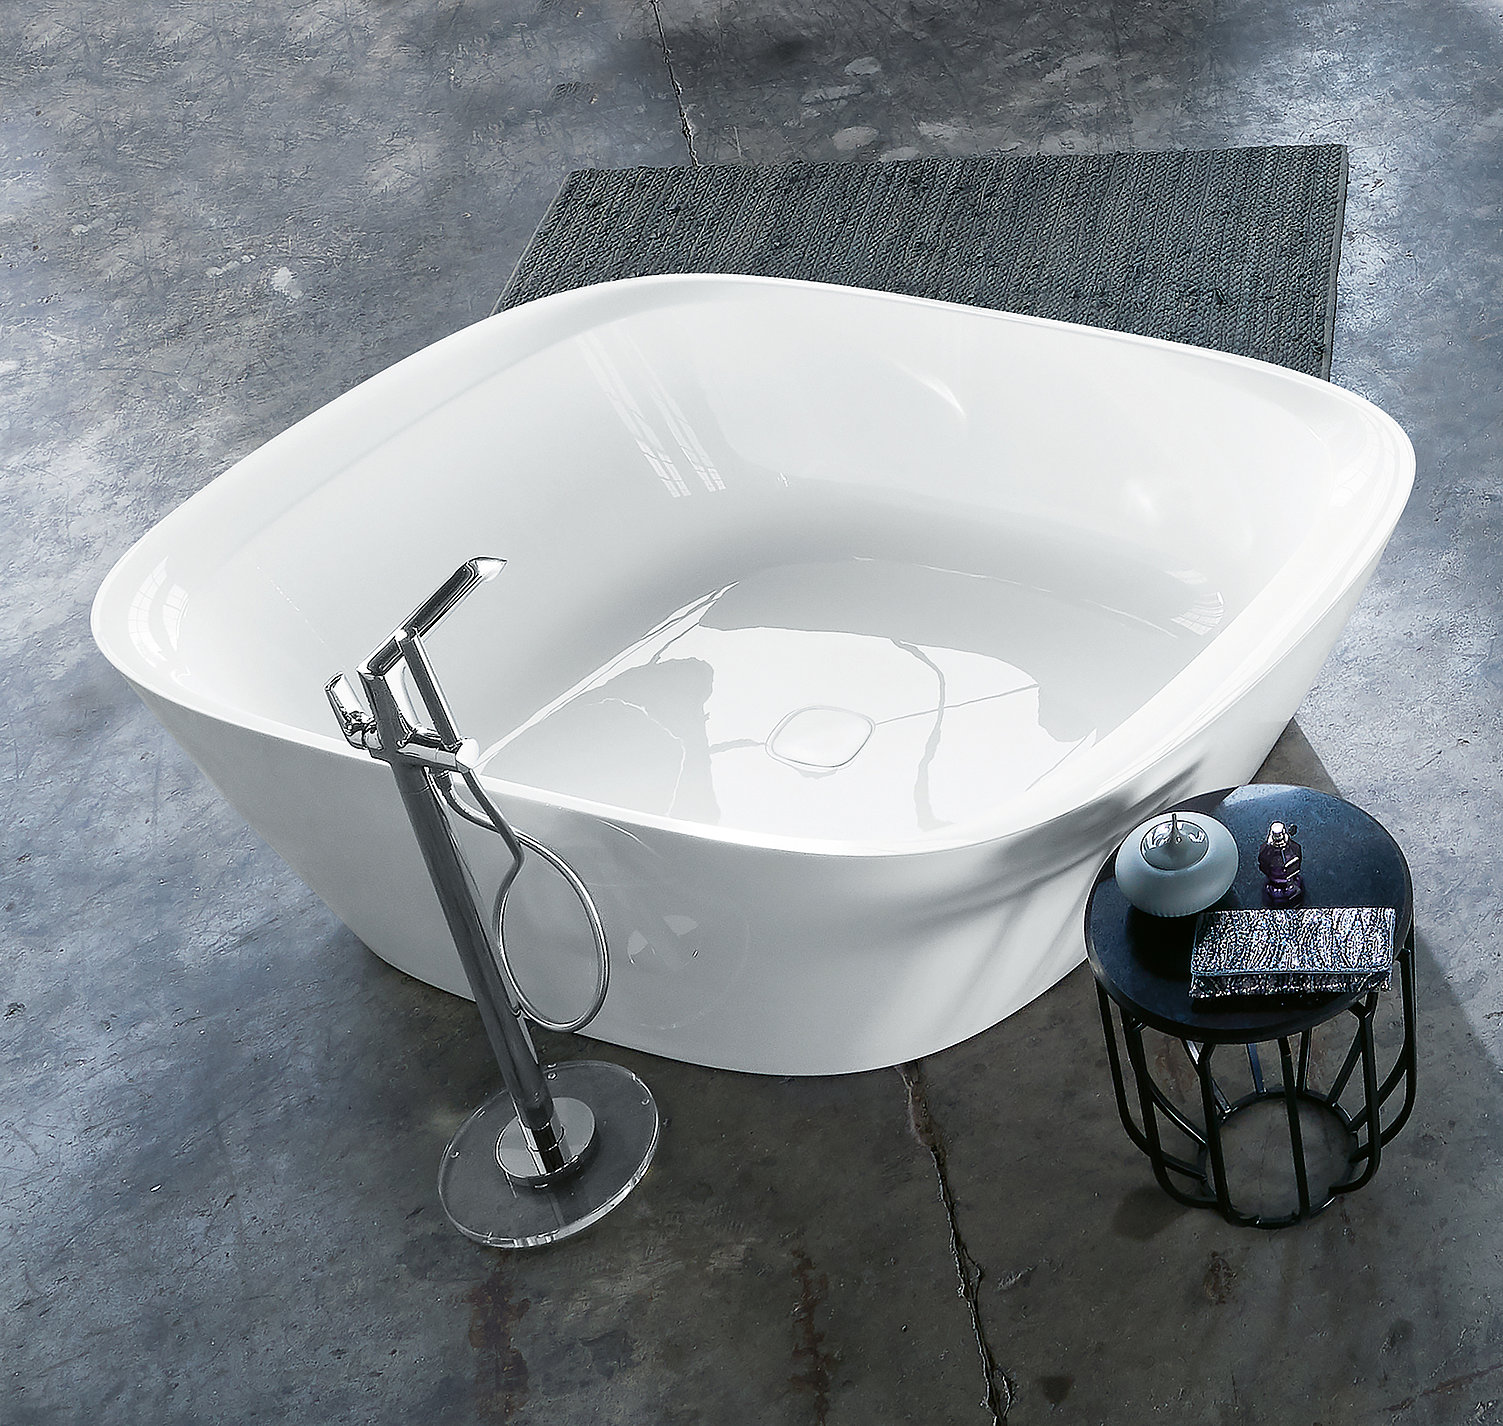 VIGOUR vogue asymmetric bathtub   Red Dot Design Award